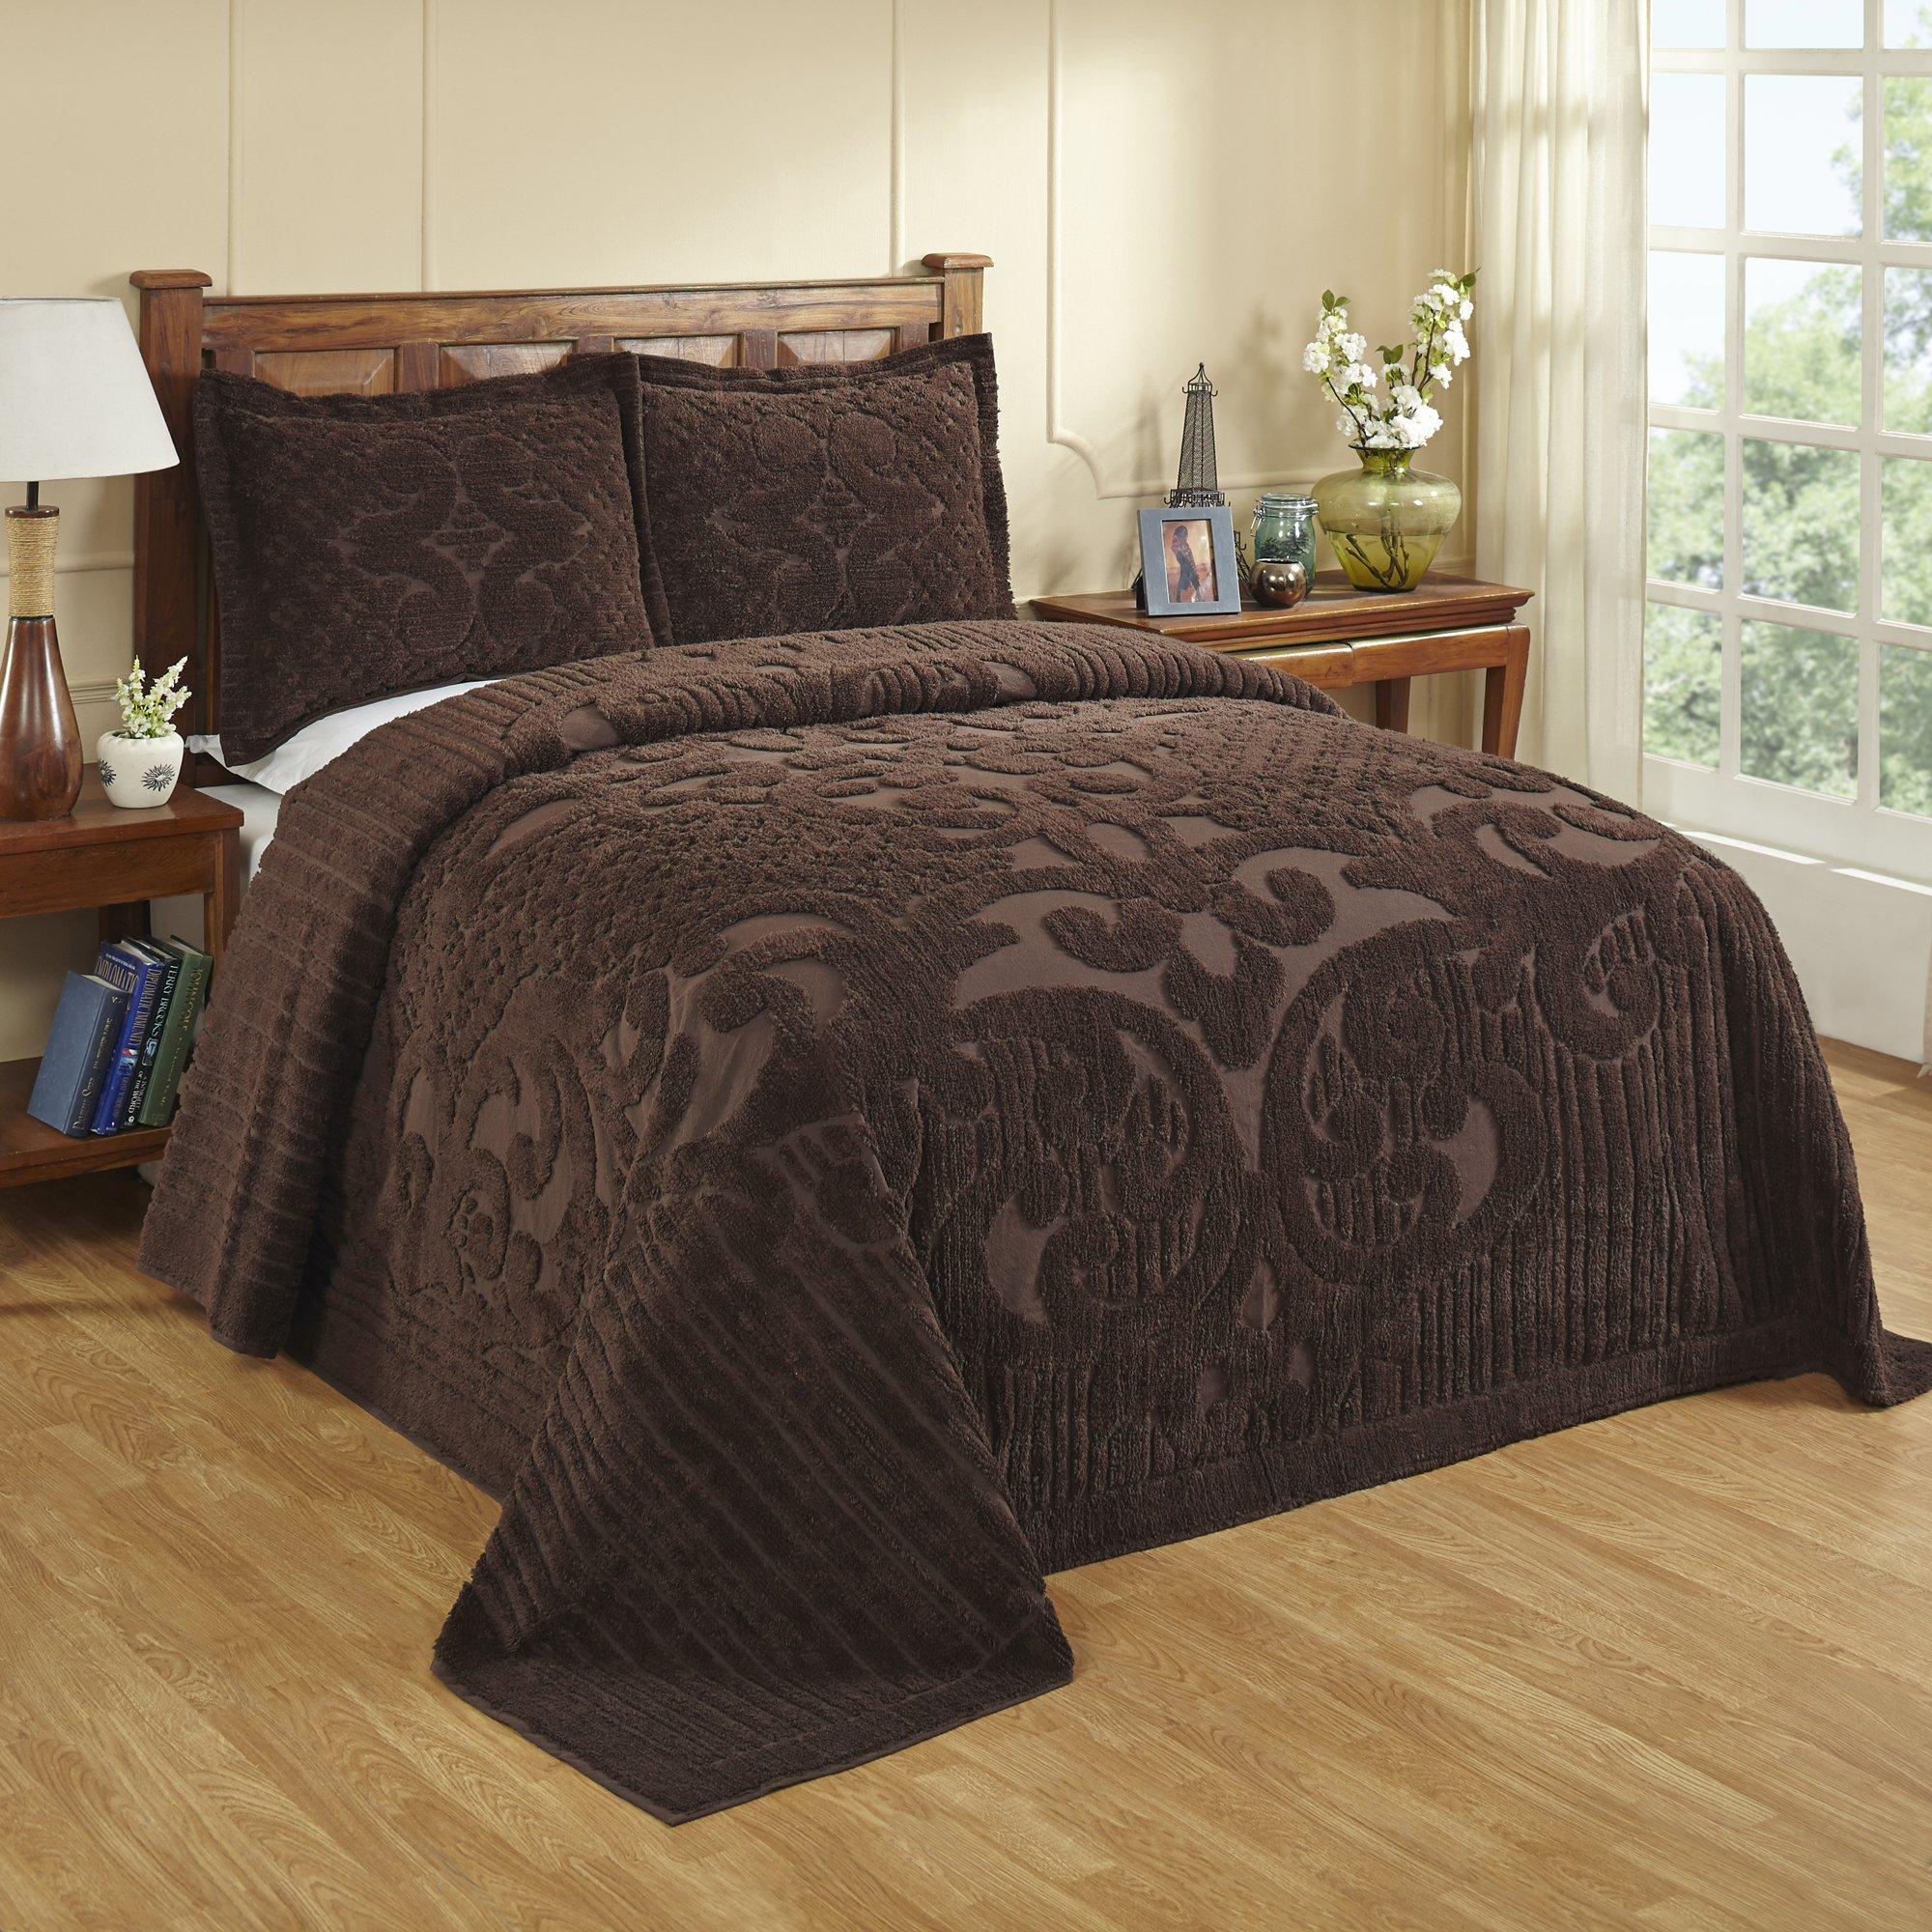 Better Trends/ Pan Overseas BSASQUCH Ashton Bedspread Chocolate/102 x 110''/Queen